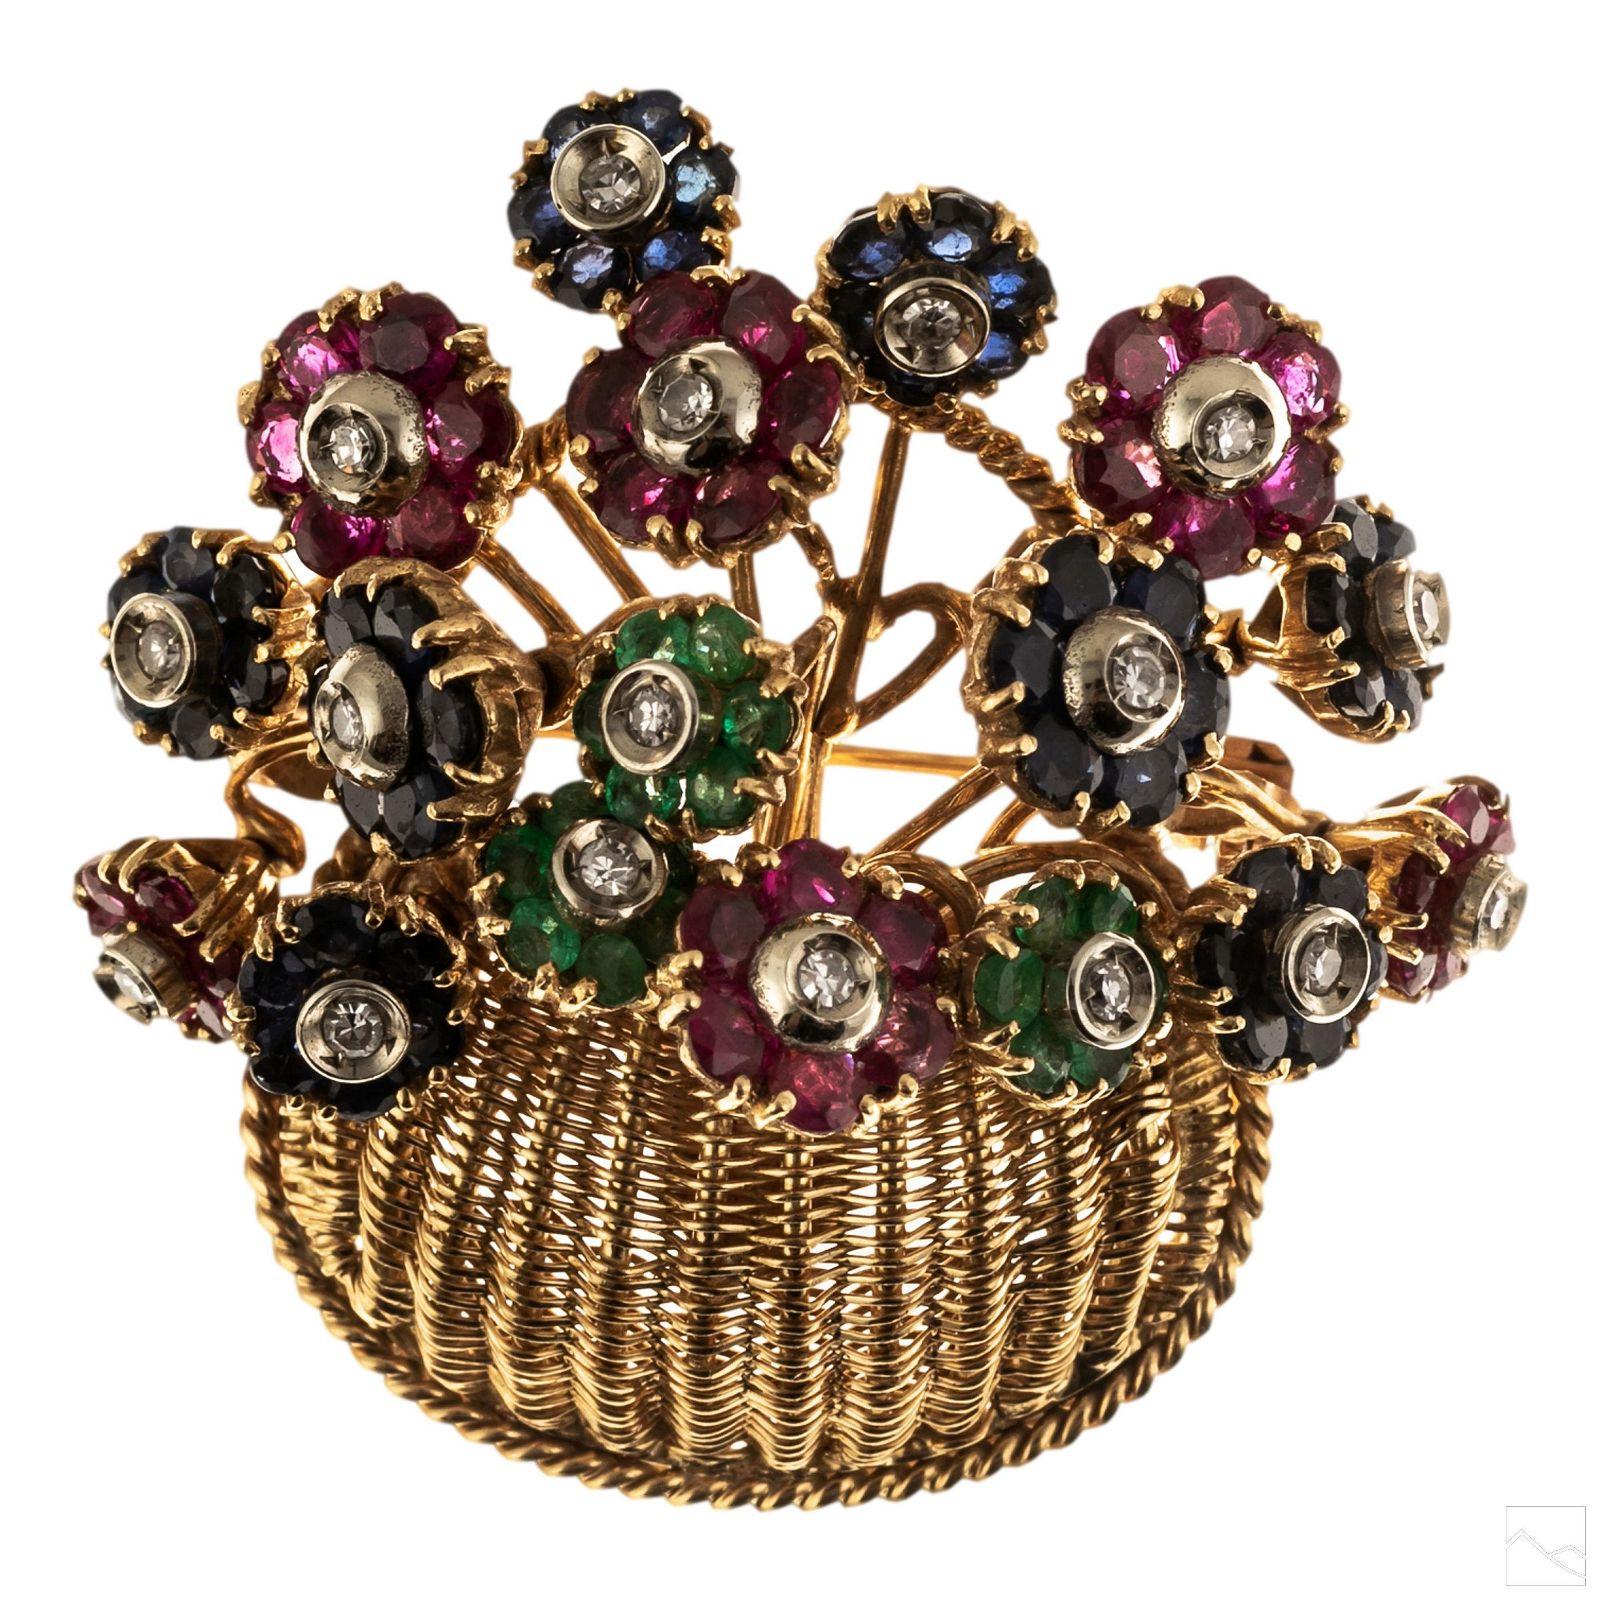 18K Gold Tiffany & Co Diamond Gems Trembler Brooch